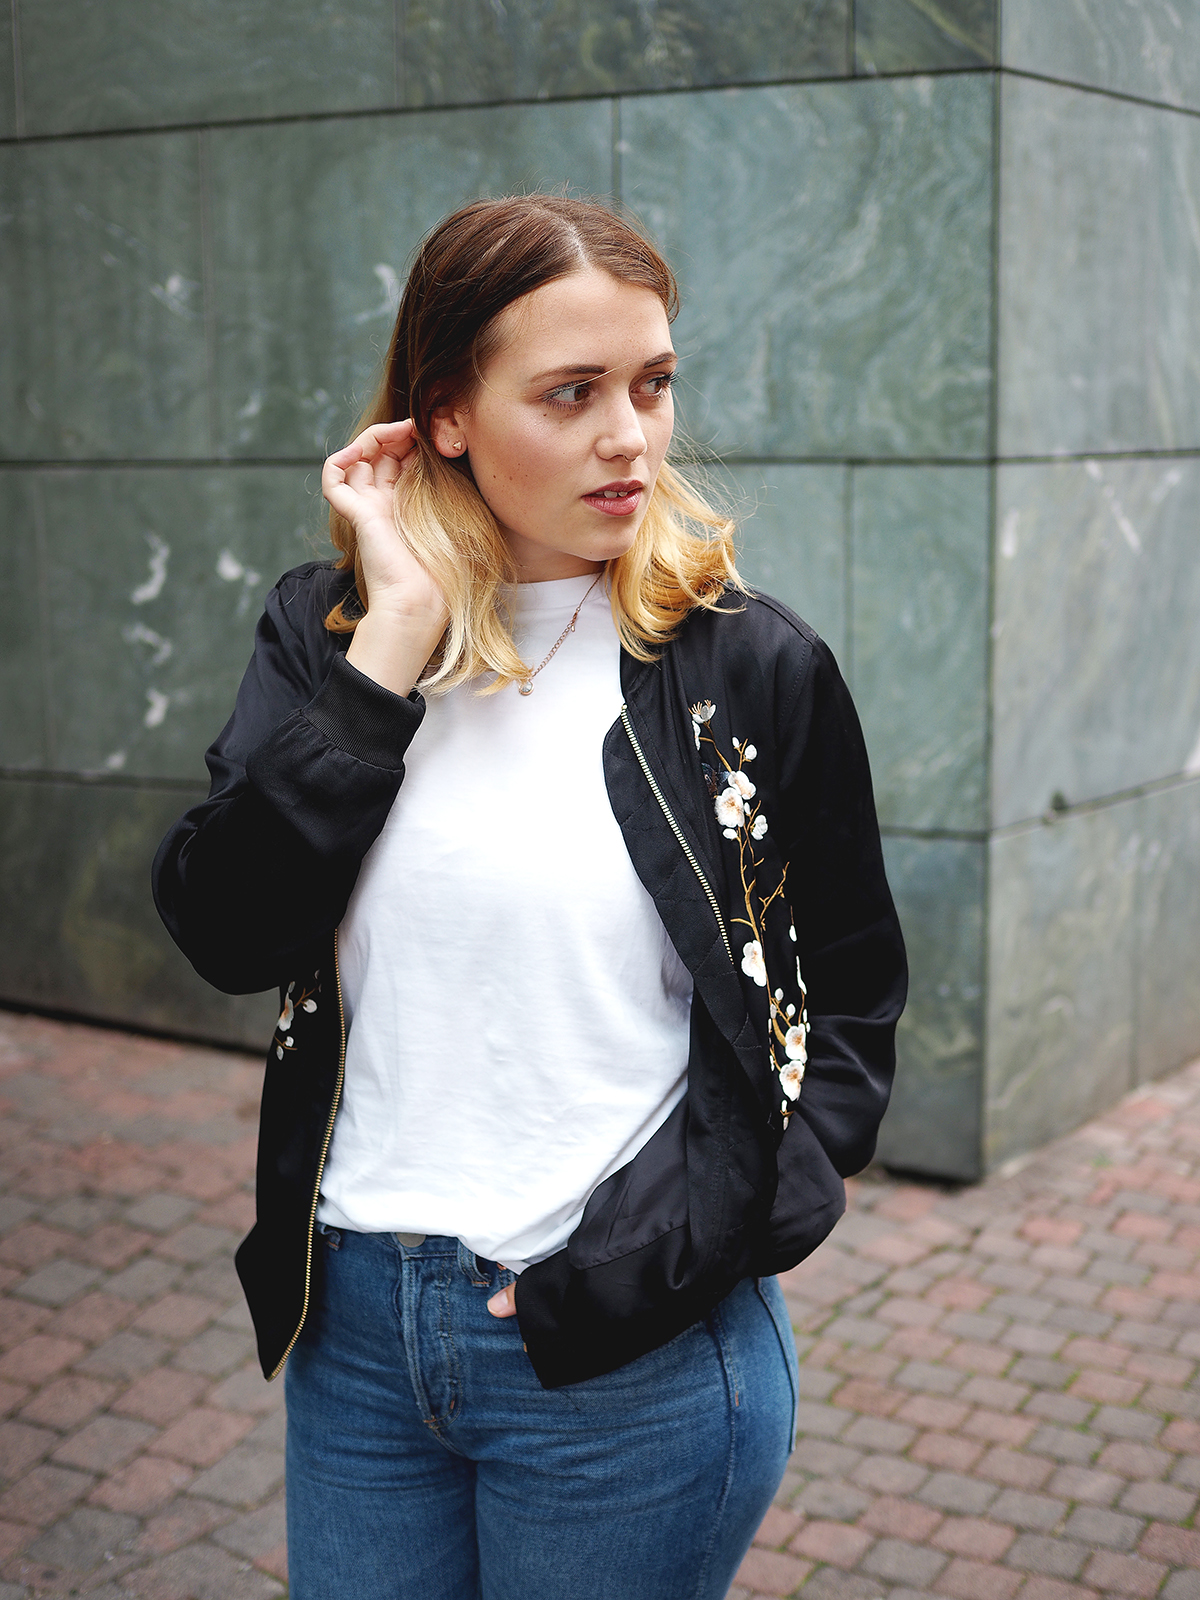 Shirt: Selected Femme, Jacke: Zara, Jeans: H&M, Schuhe: Reebok